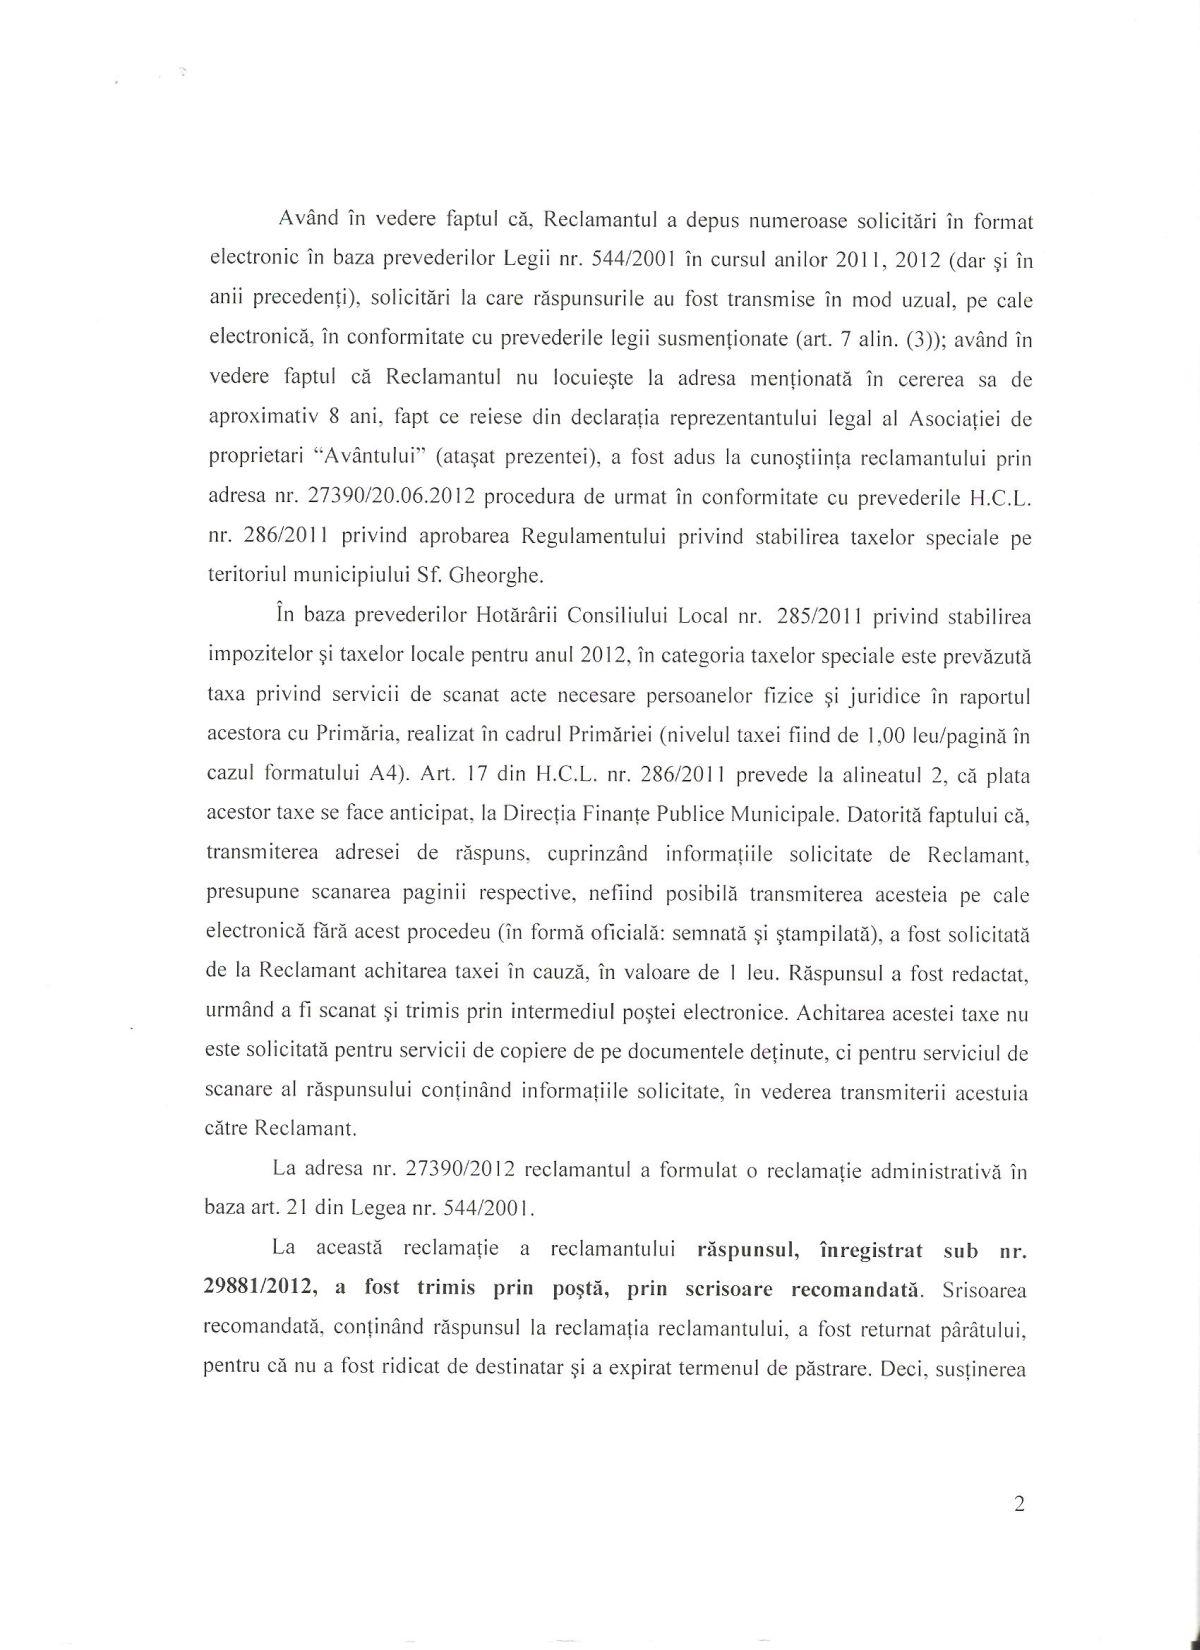 Intampinare Primar Sfantu Gheorghe Tribunal Covasna Legea 544/2001 Dan Tanasa